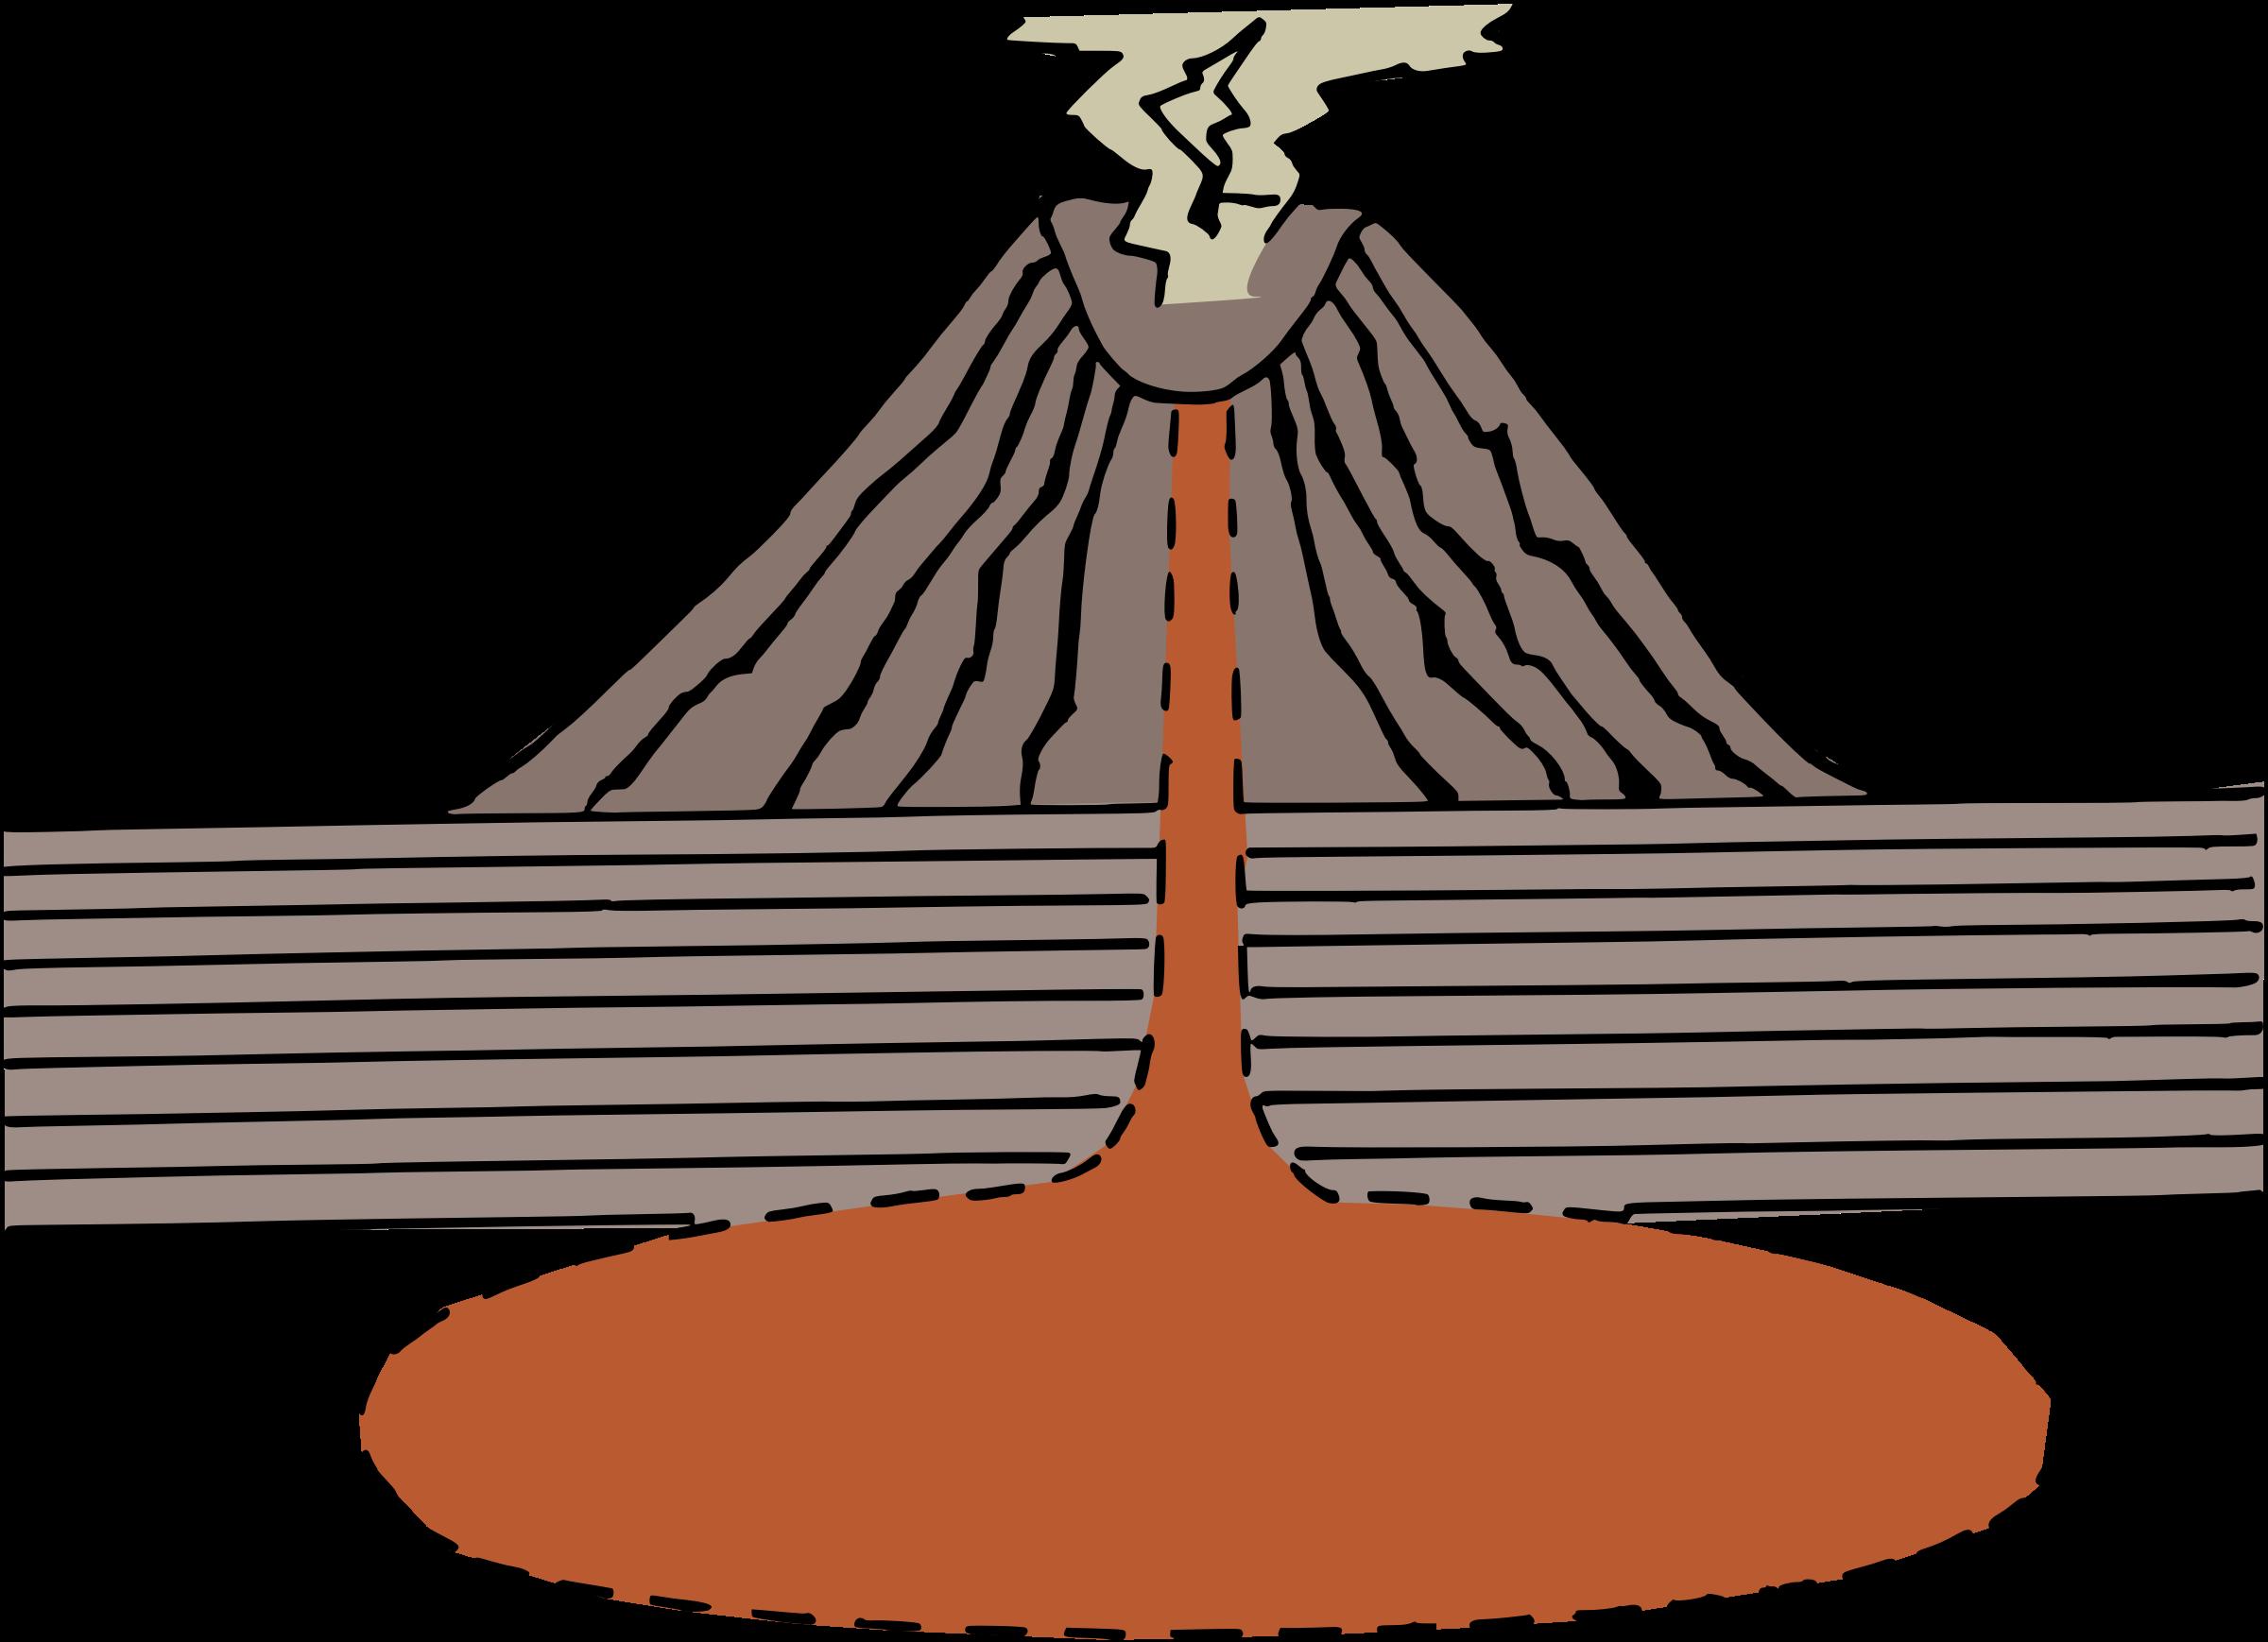 Clipart volcano diagram volcano diagram ccuart Images